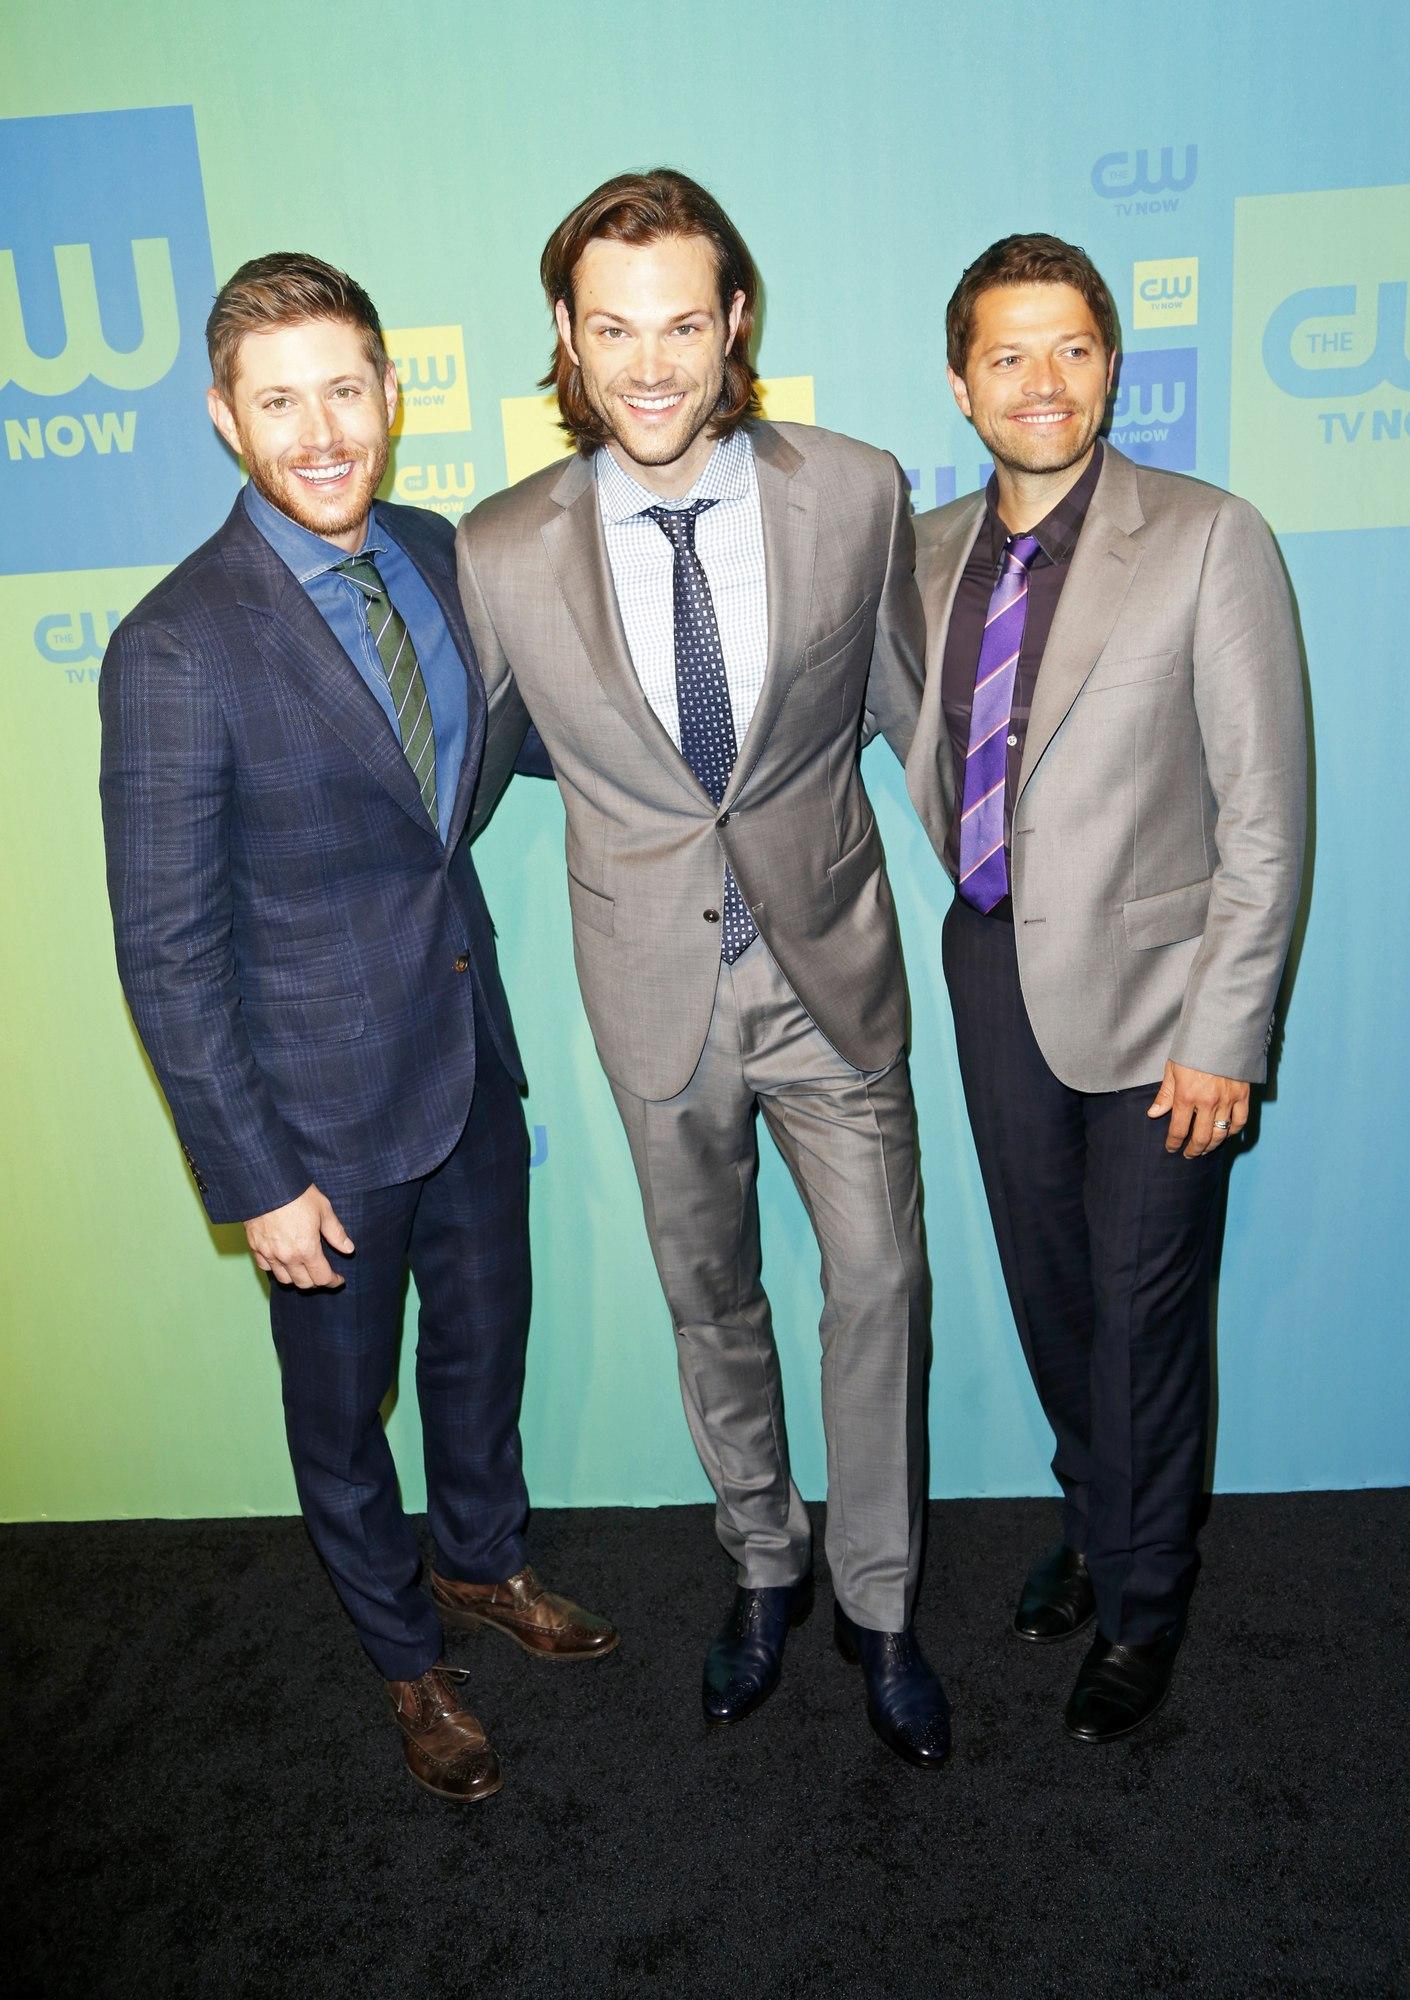 CW Upfronts 2014 - Jared Padalecki Photo (37081632) - Fanpop